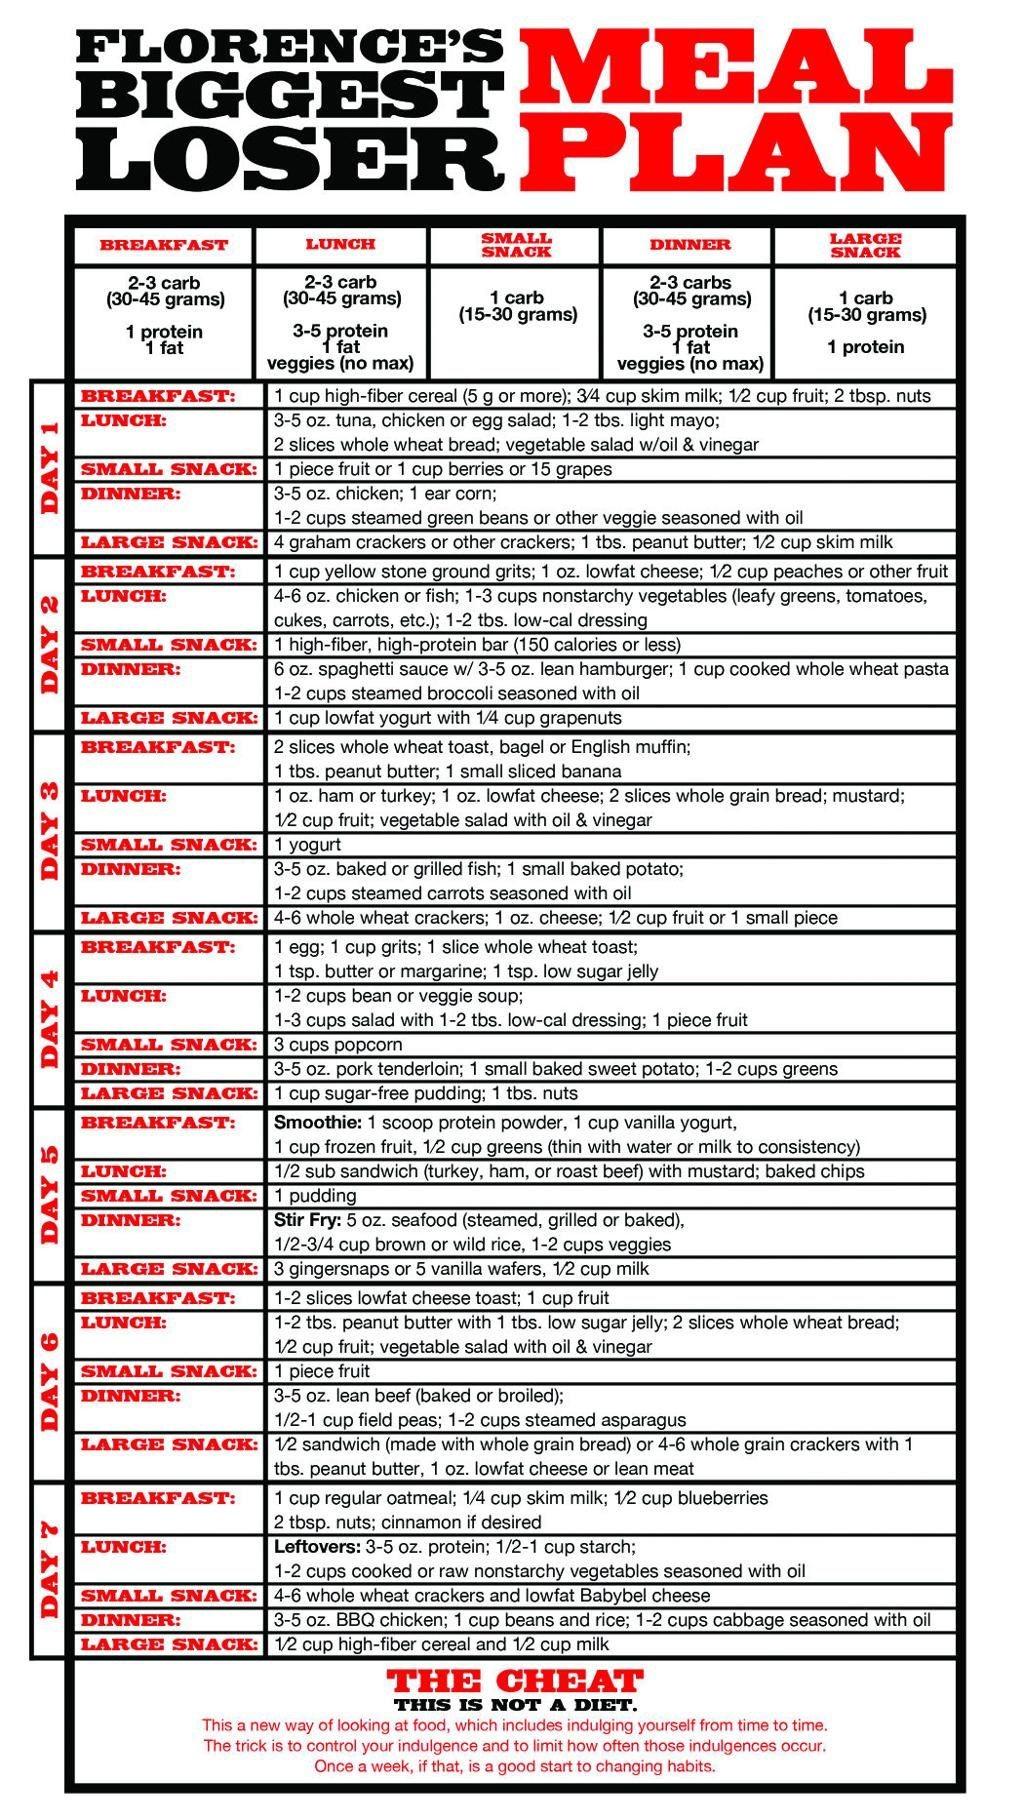 001 Impressive Eating Plan Template Pdf High Def  Food Safety Sample Keto Meal Gestational DiabeteLarge